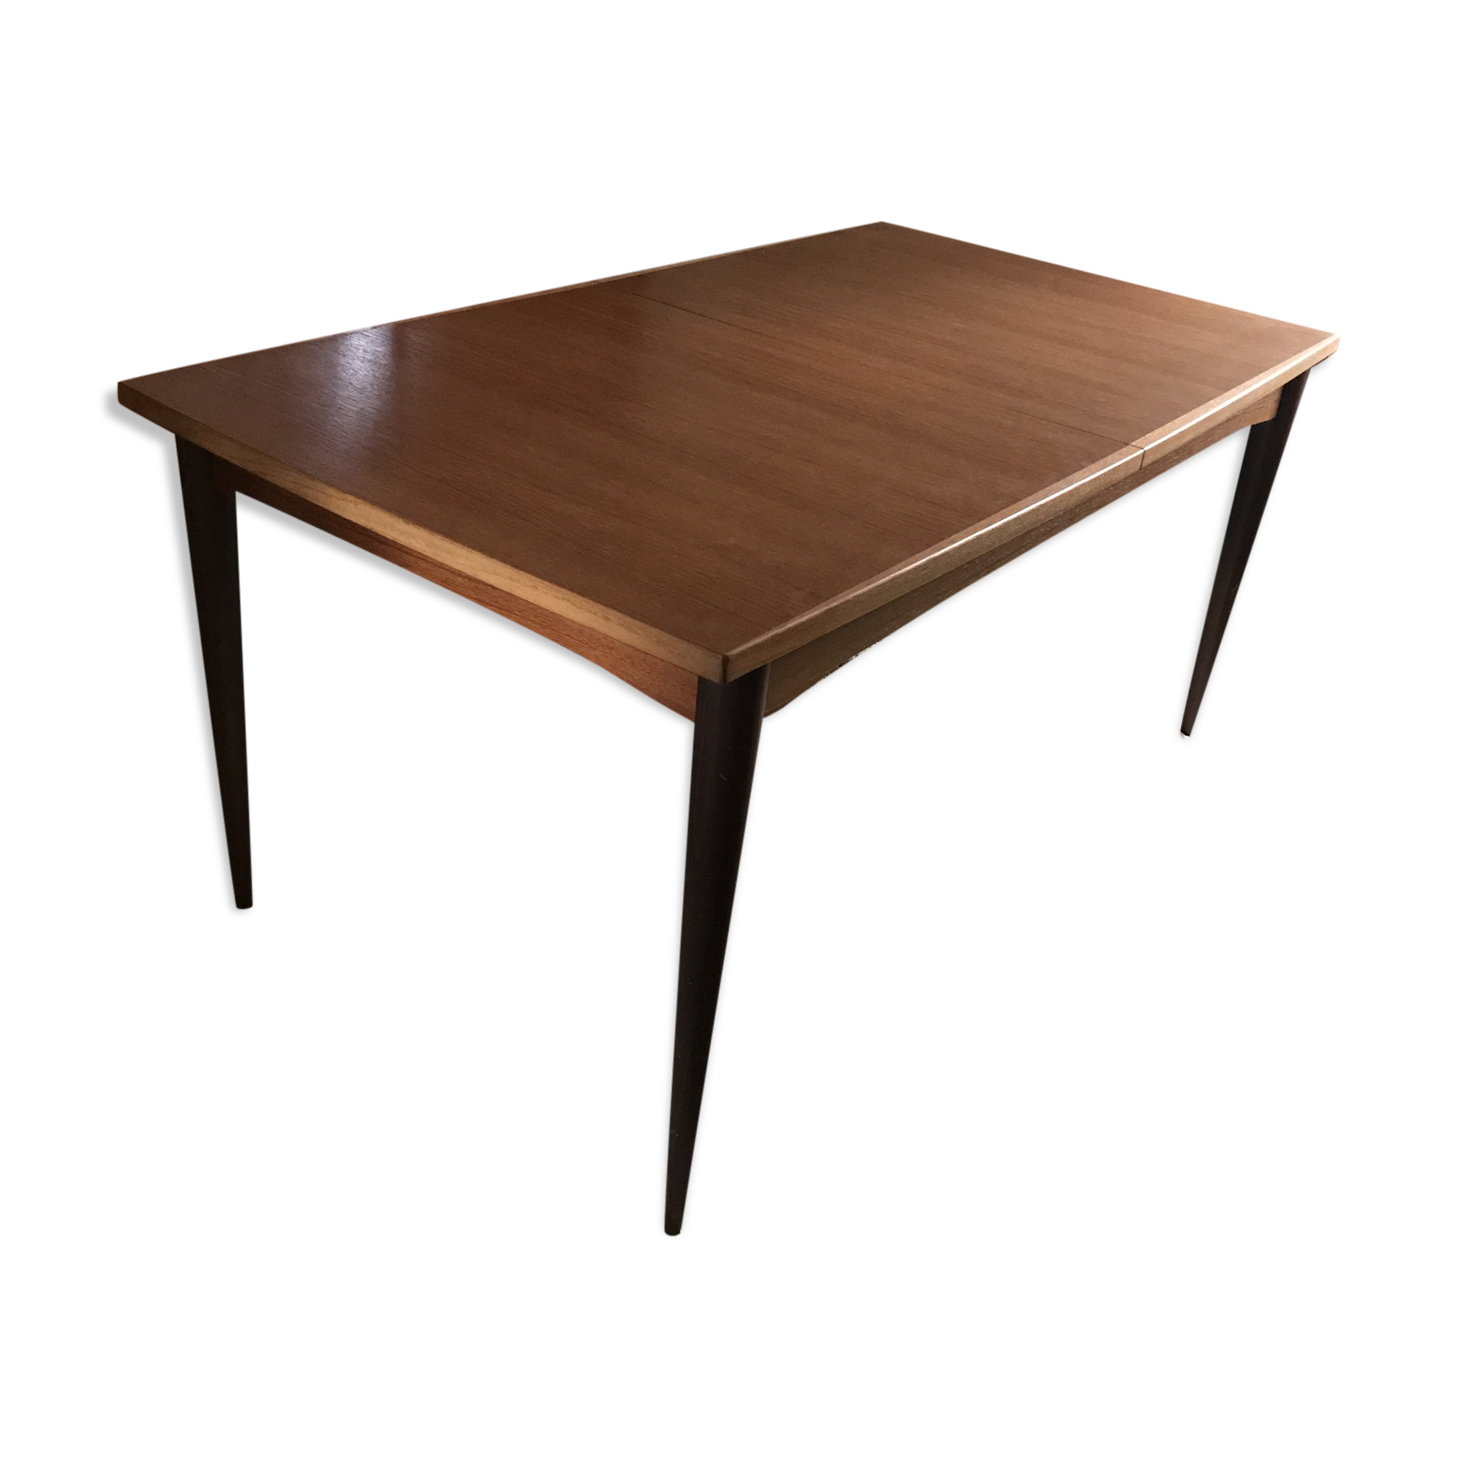 table en teck avec rallonge fabulous awesome table de jardin tout aluminium avec rallonge ideas. Black Bedroom Furniture Sets. Home Design Ideas